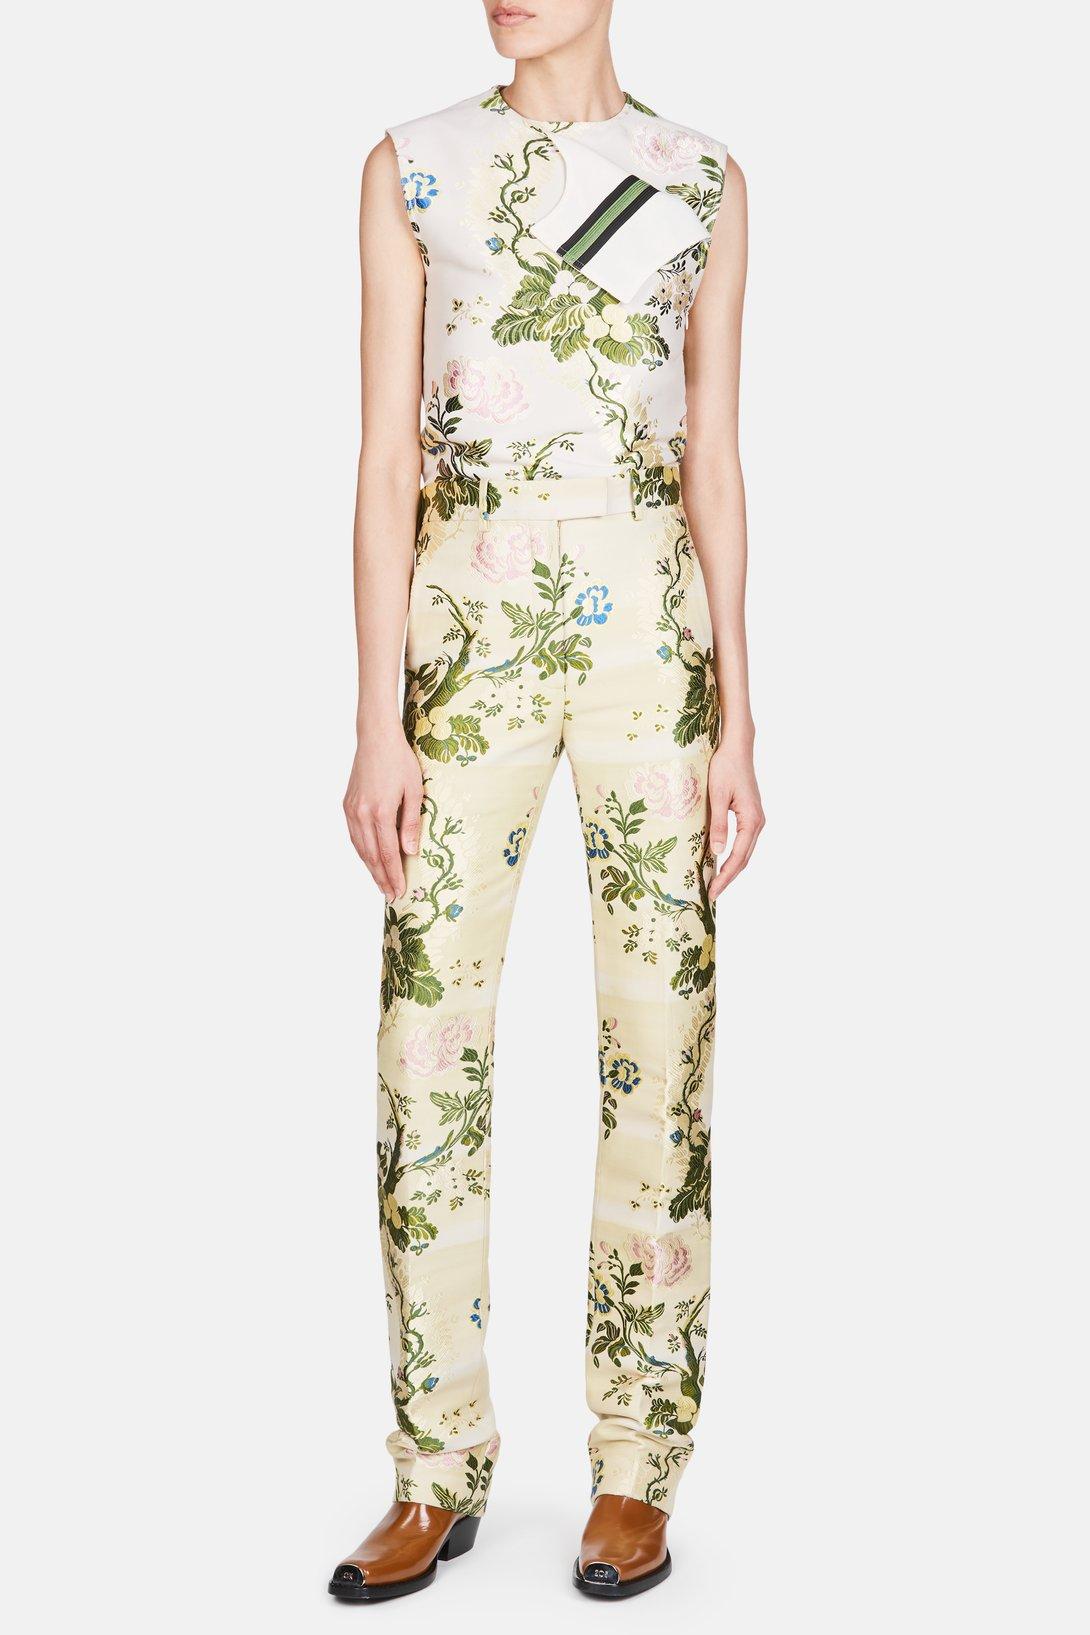 Calvin Klein Pants, Was $1,695 - Now $509